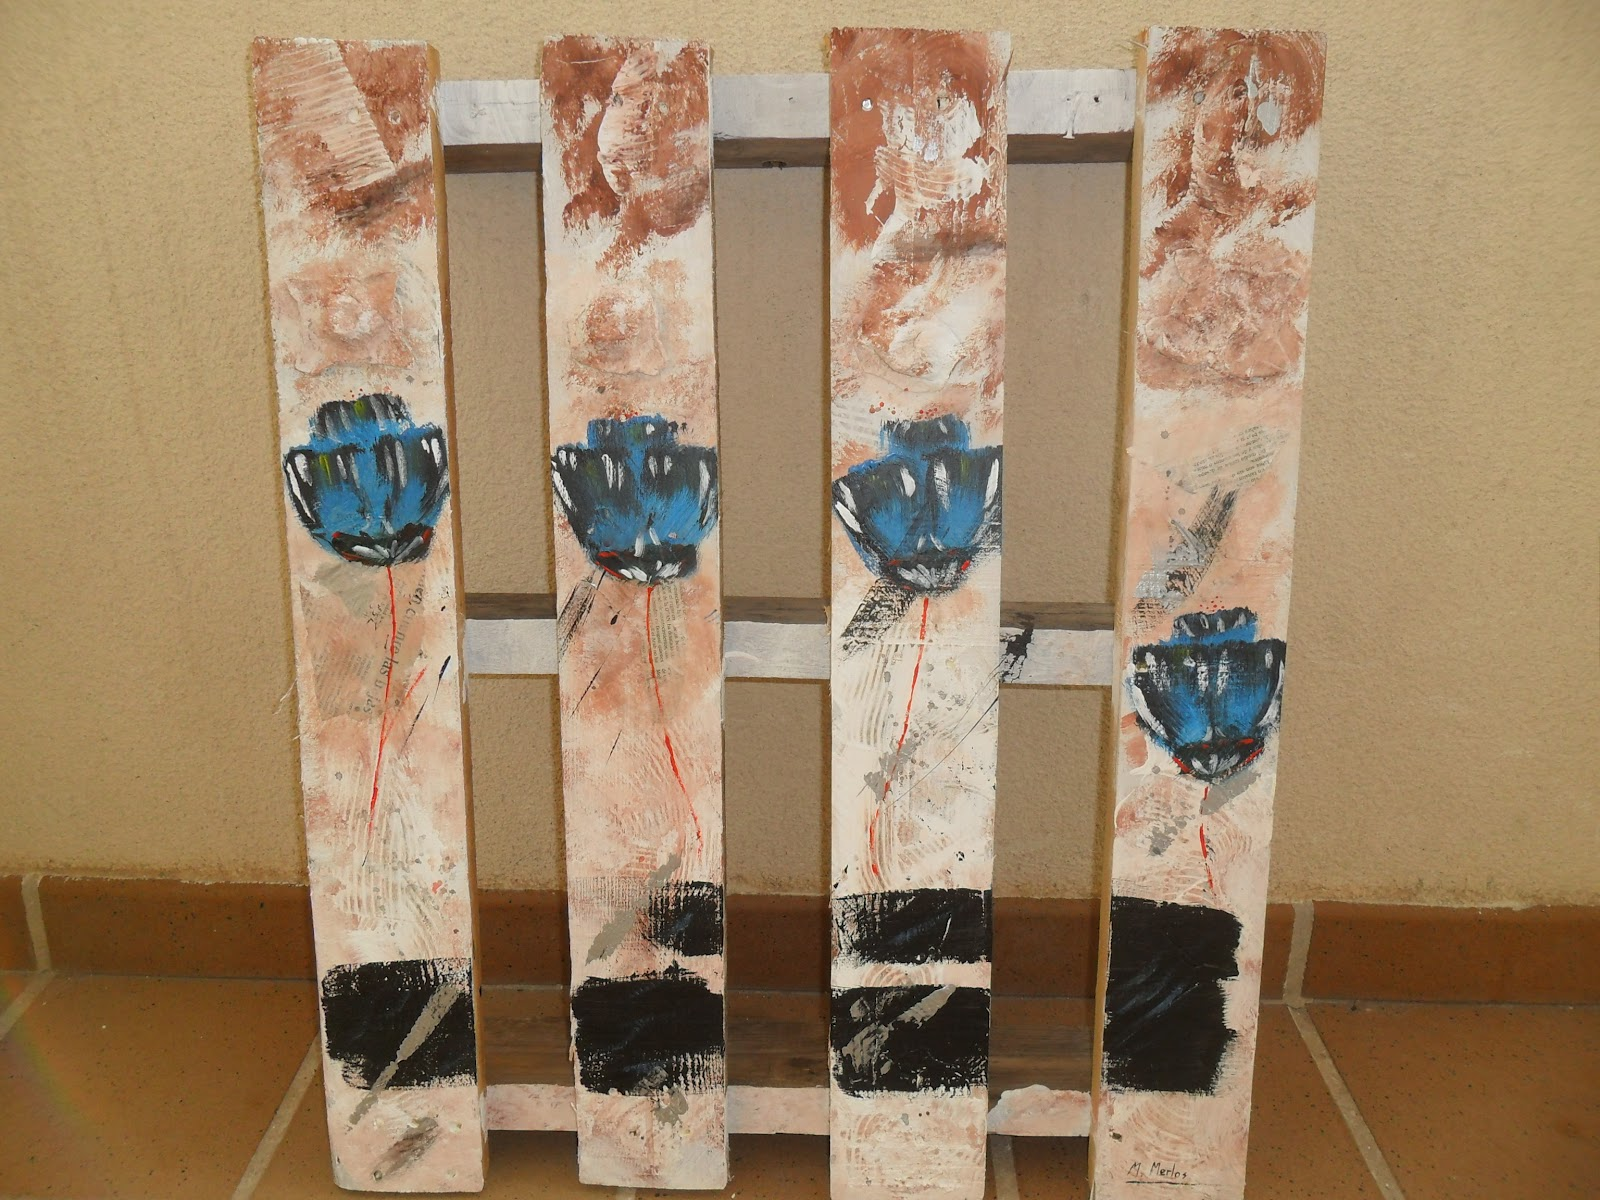 El Baul Del Reciclaje Palet Pintura Abstracta - Reciclaje-de-palet